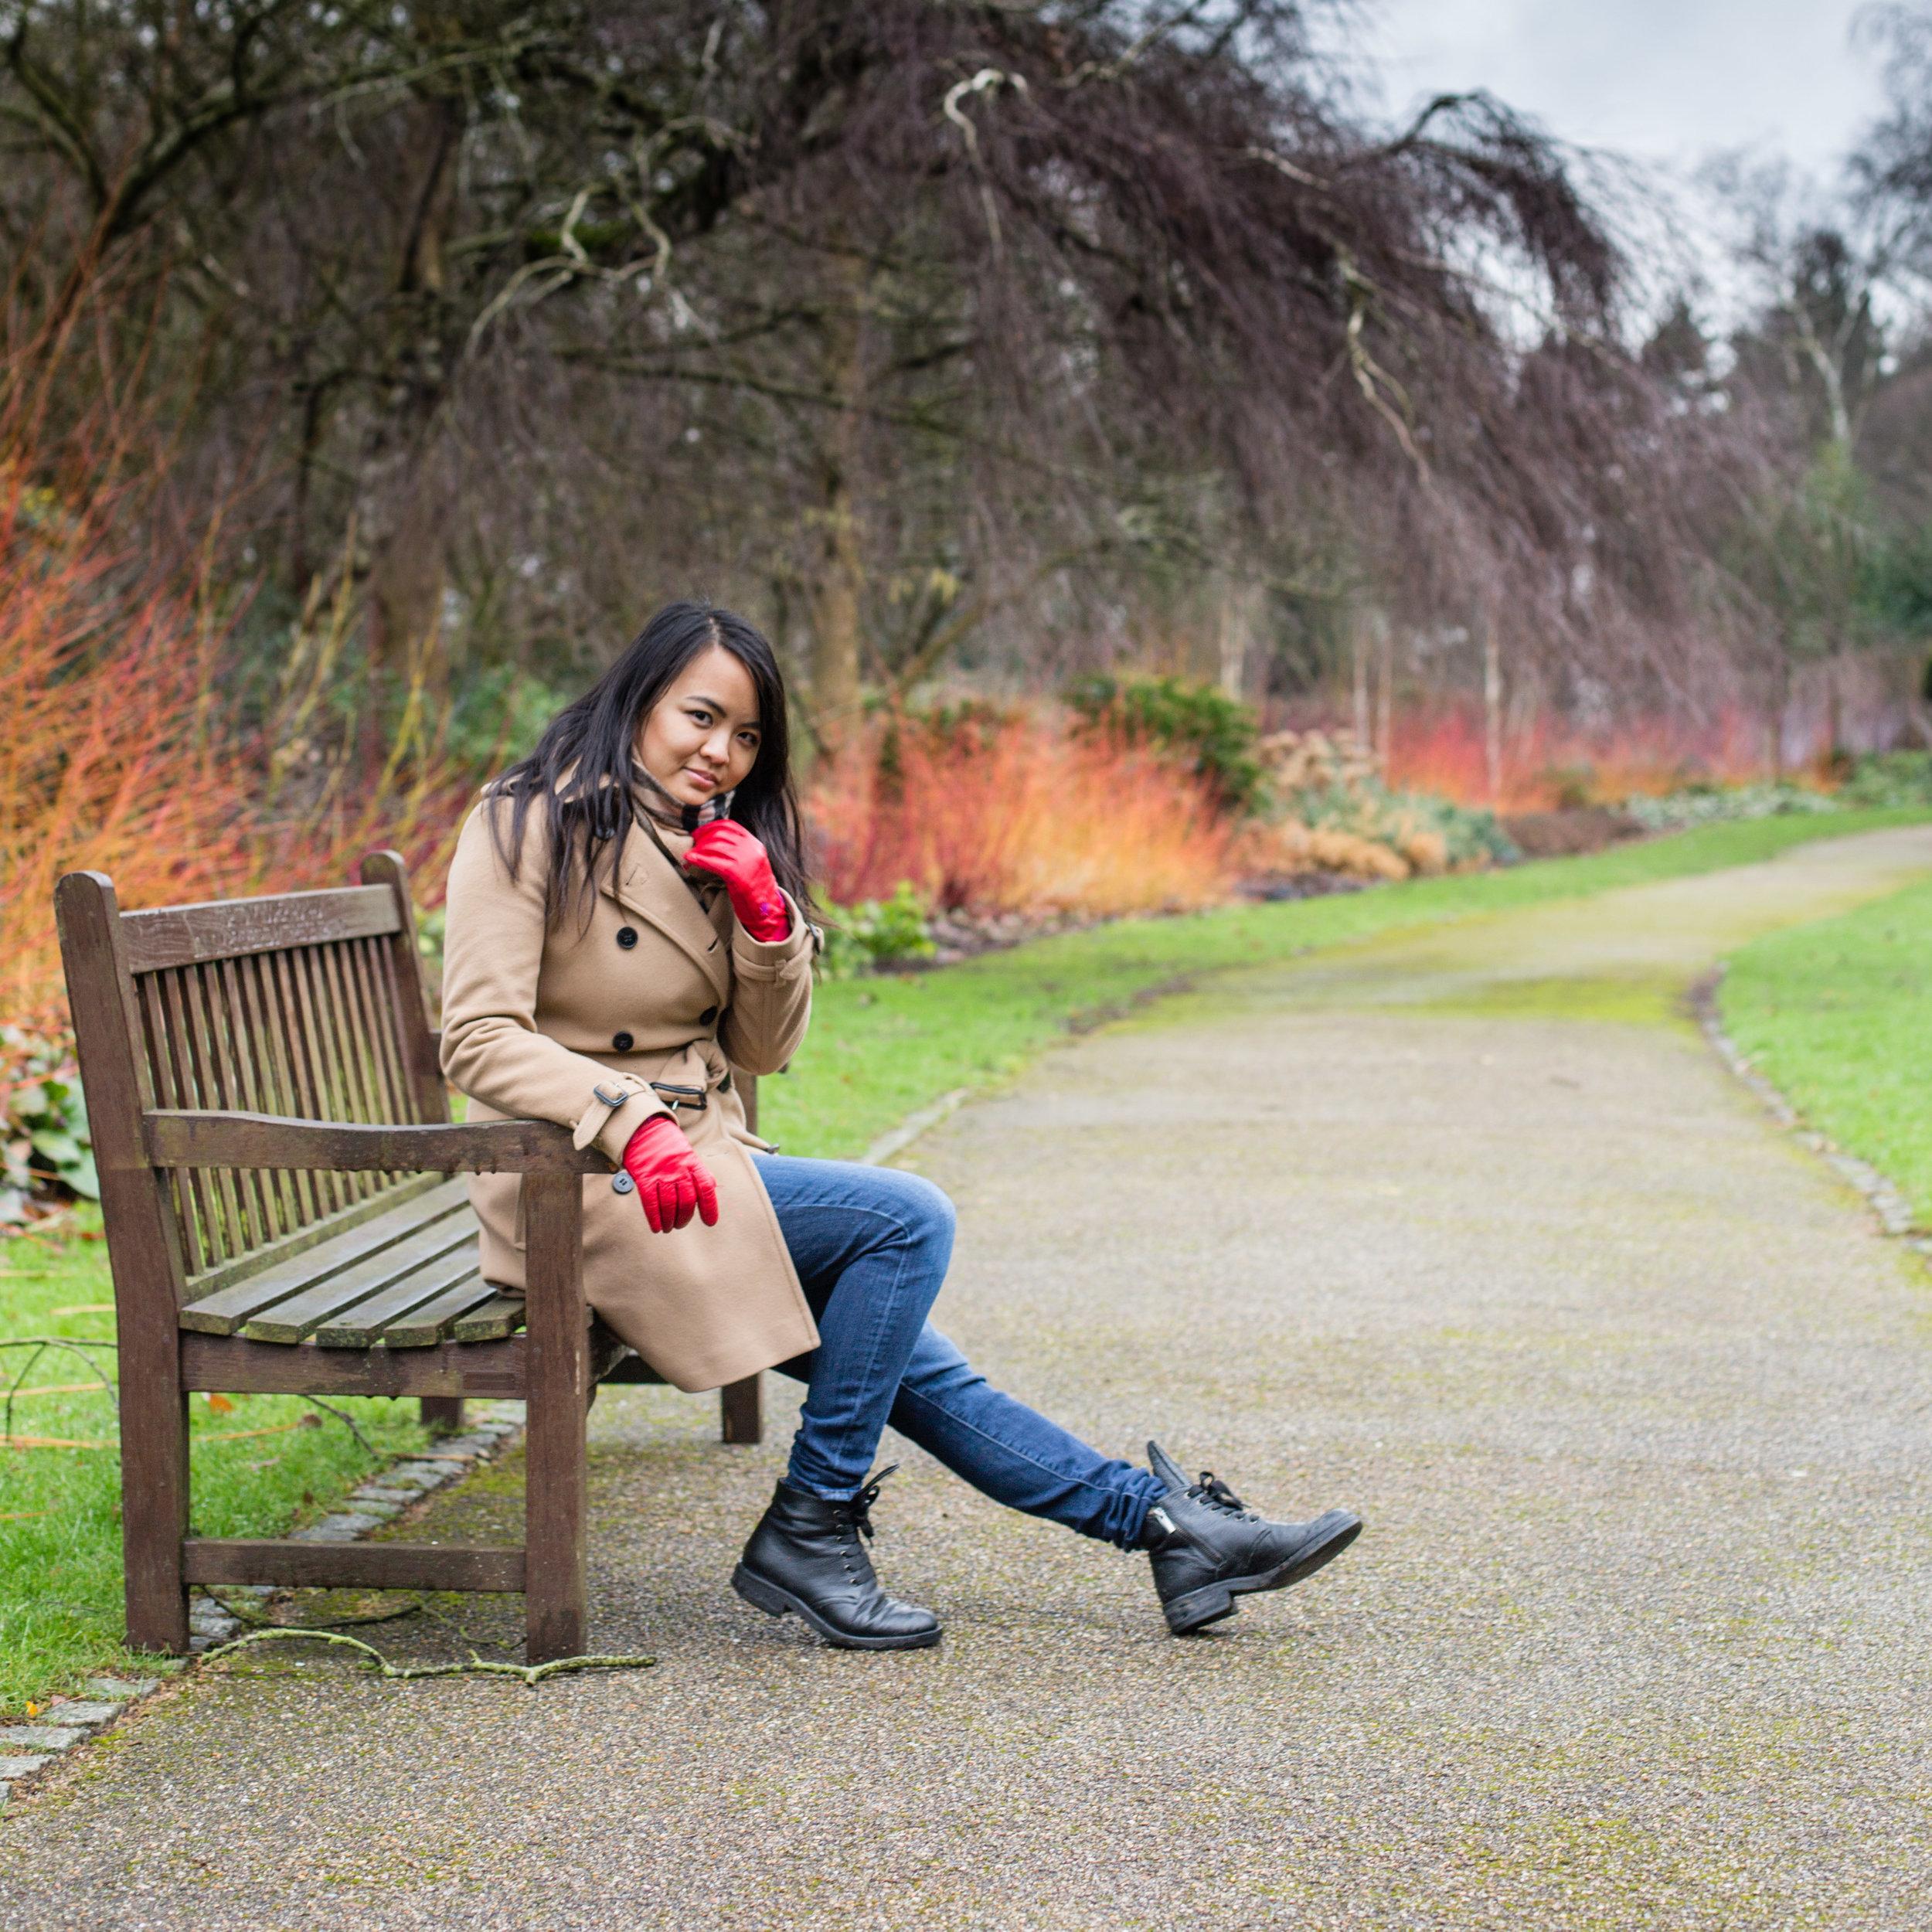 Golders Hill Park. Travel Diana Von R London Photographer NW3